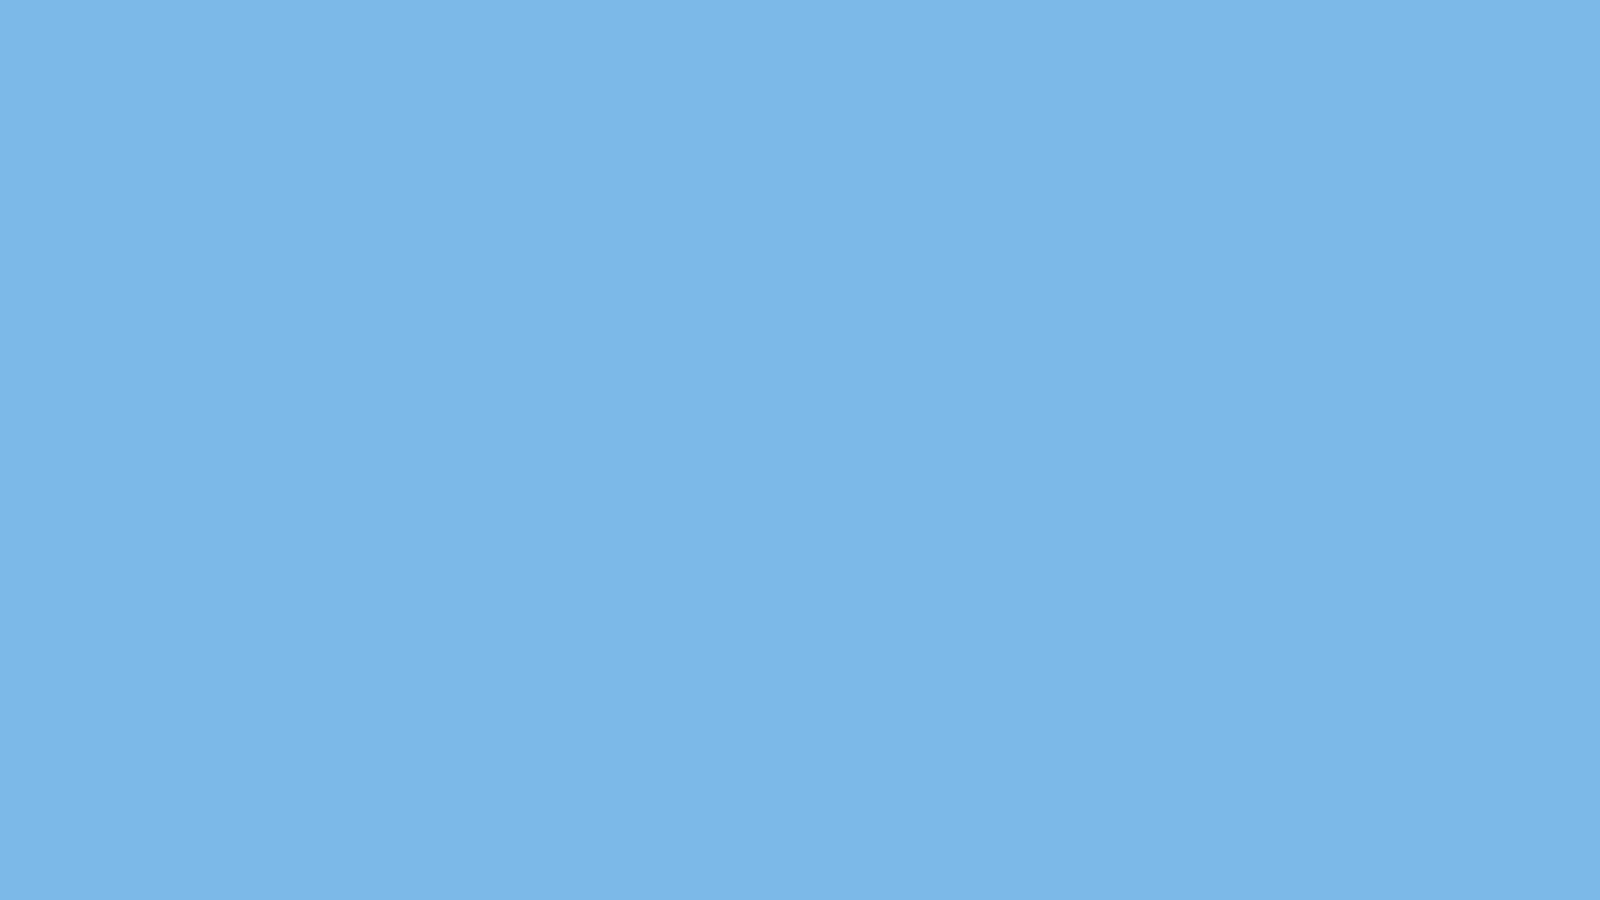 1600x900 Aero Solid Color Background